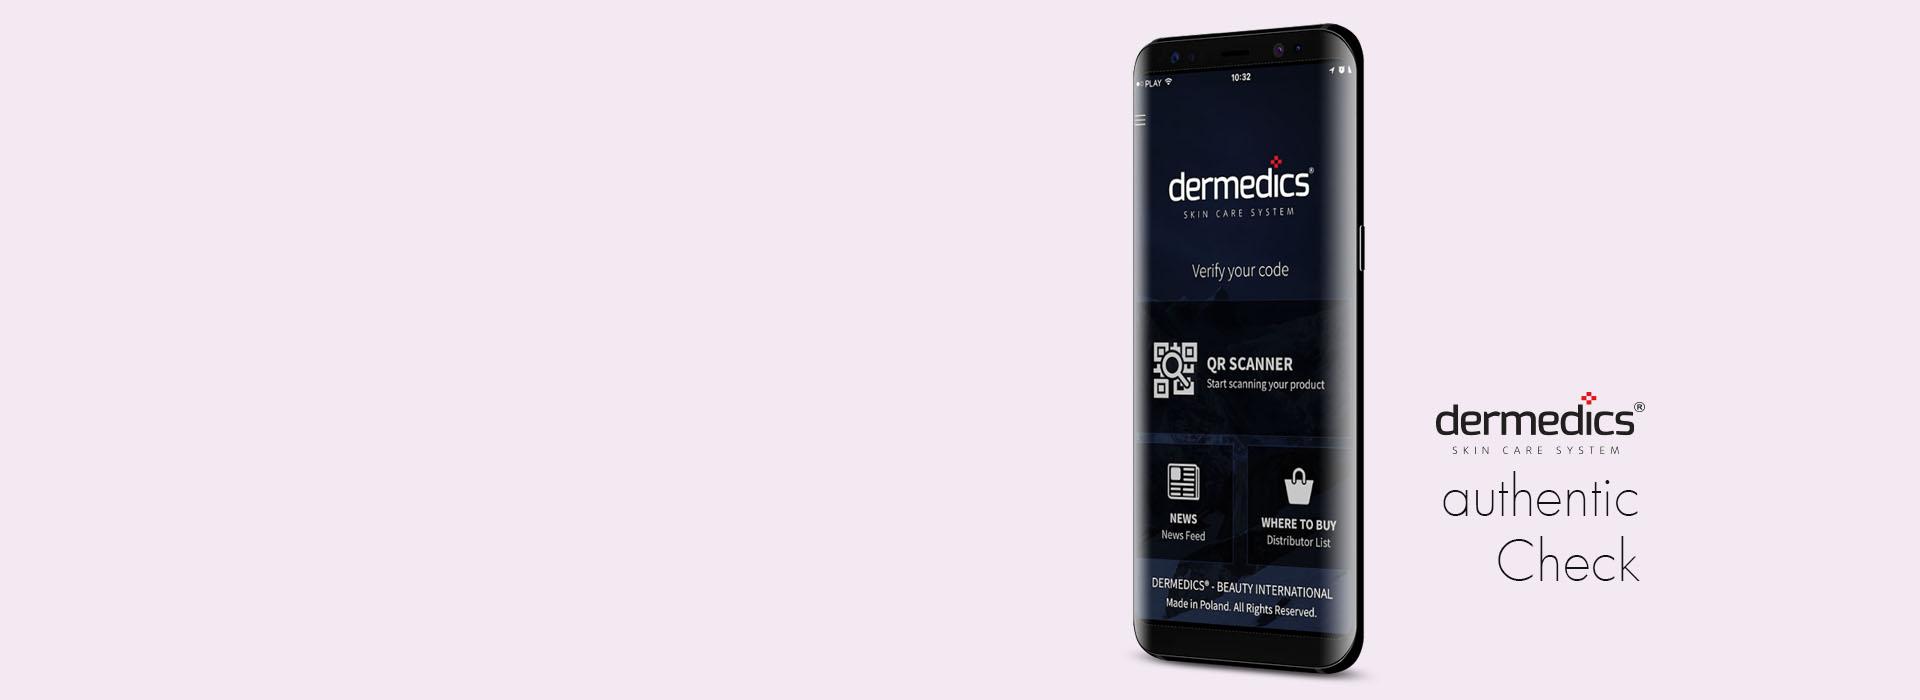 dermetics-app